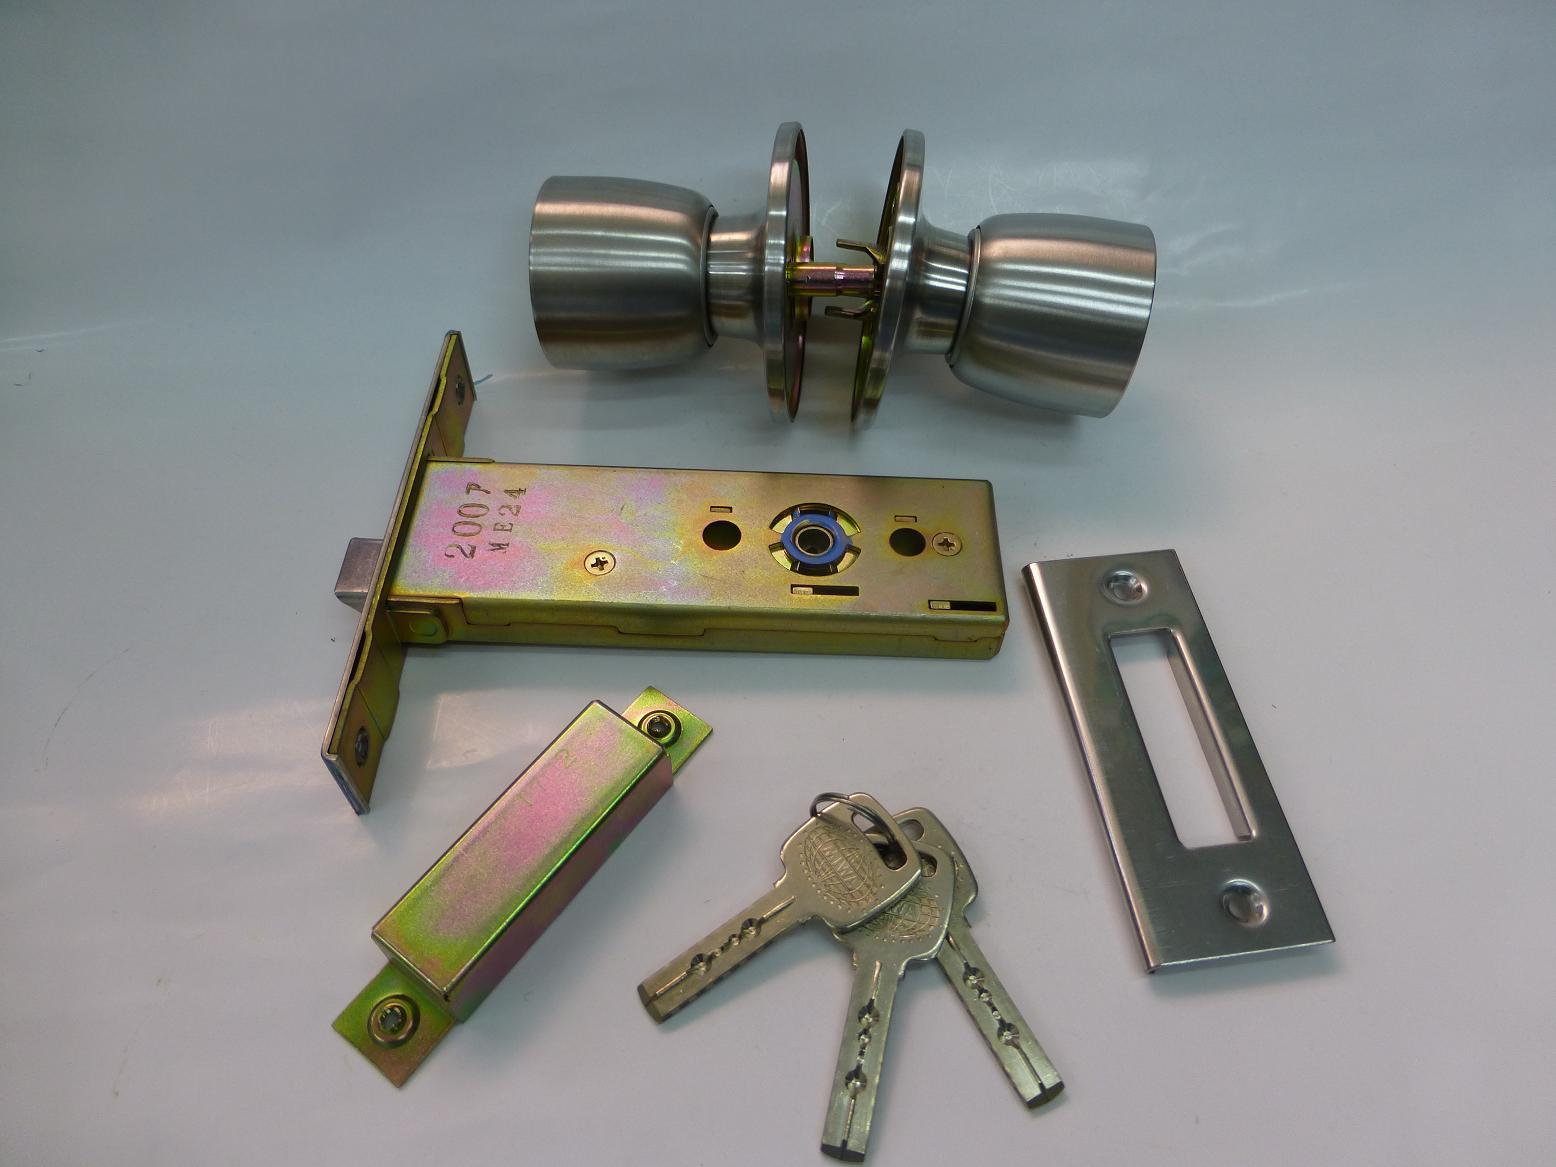 MIWA 握り玉錠 EC 145HMD-1